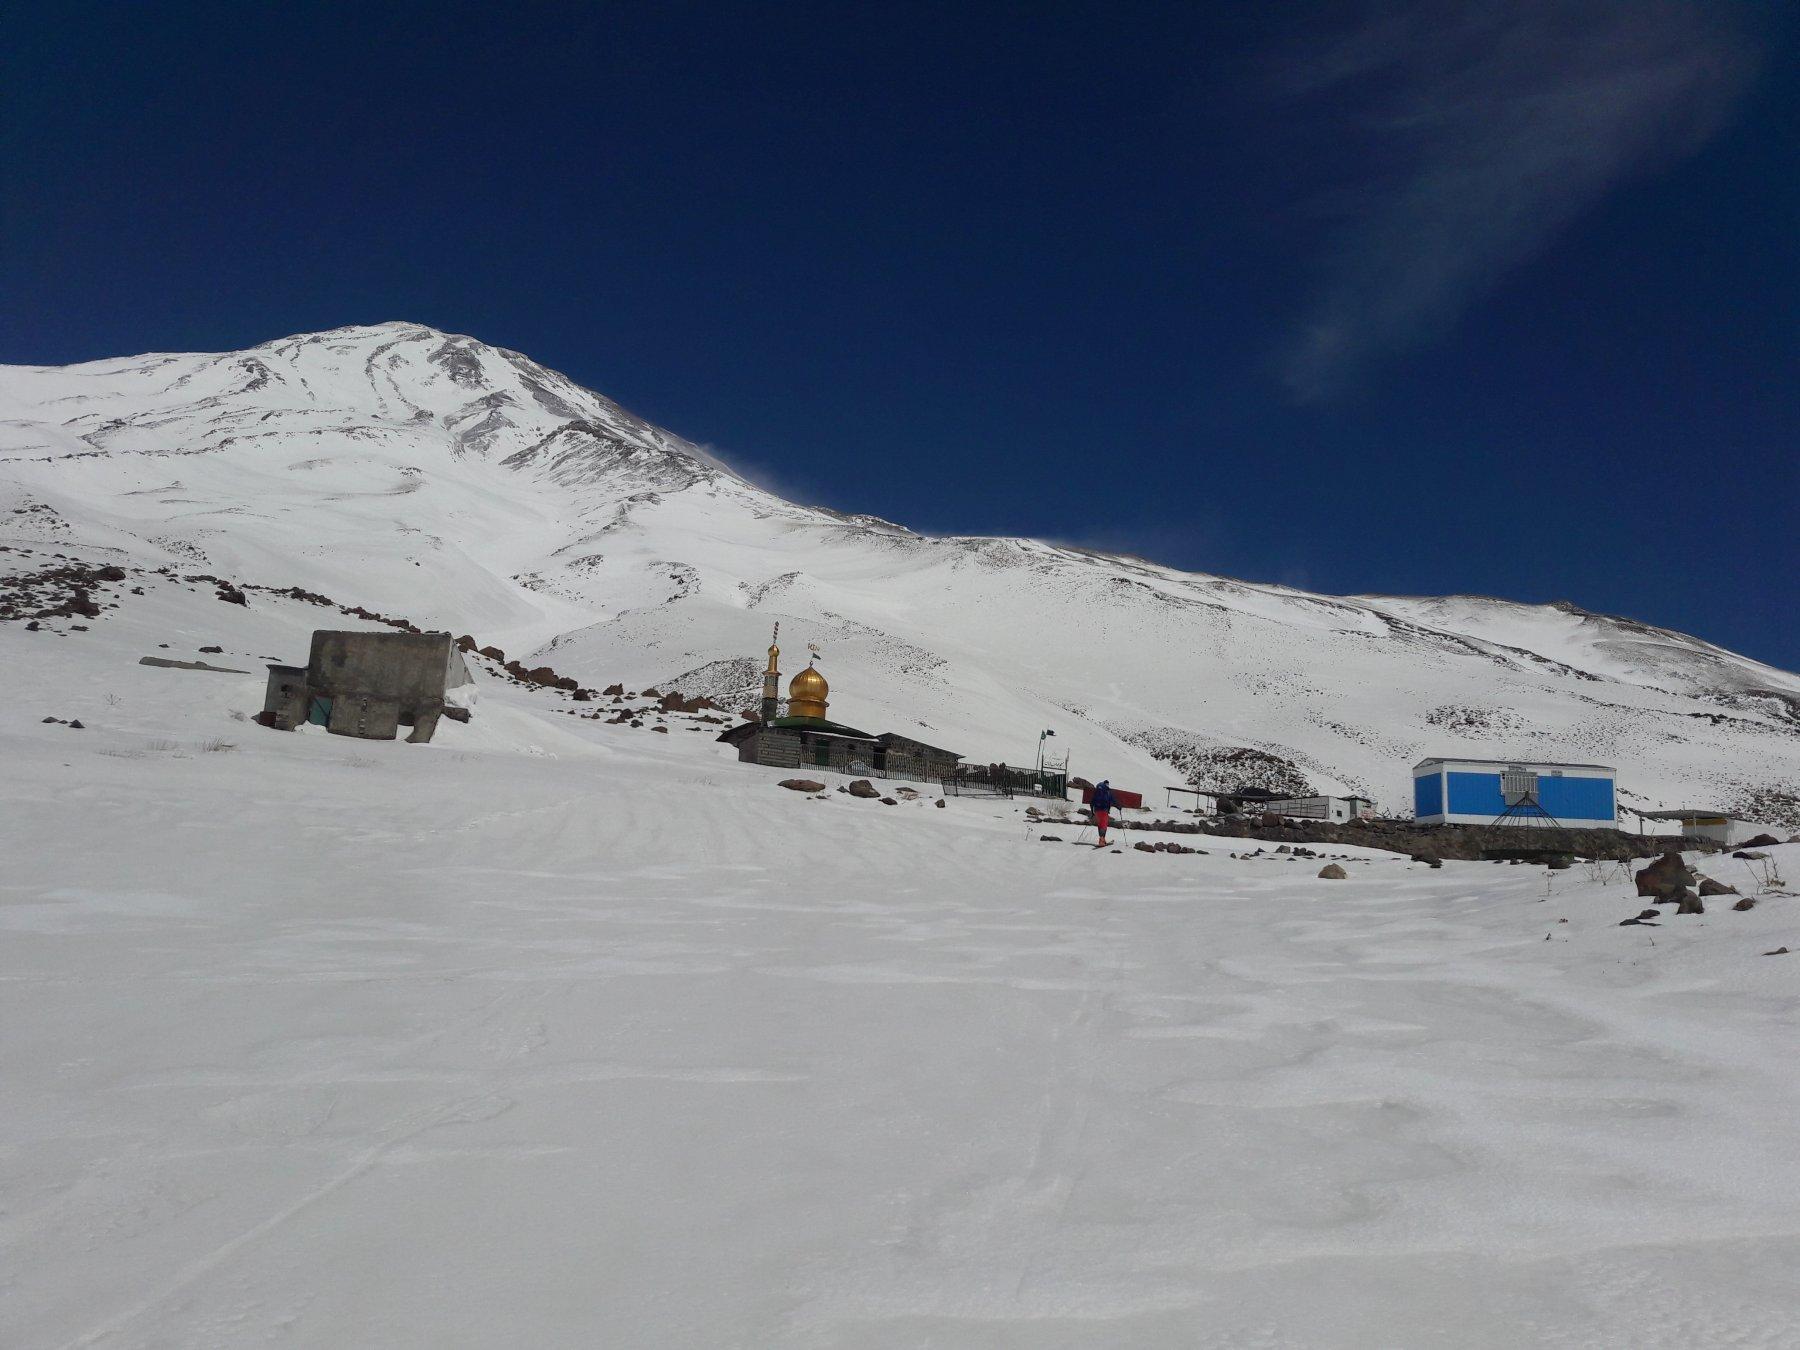 Damavand (Monte) dal Versante Sud 2019-04-05